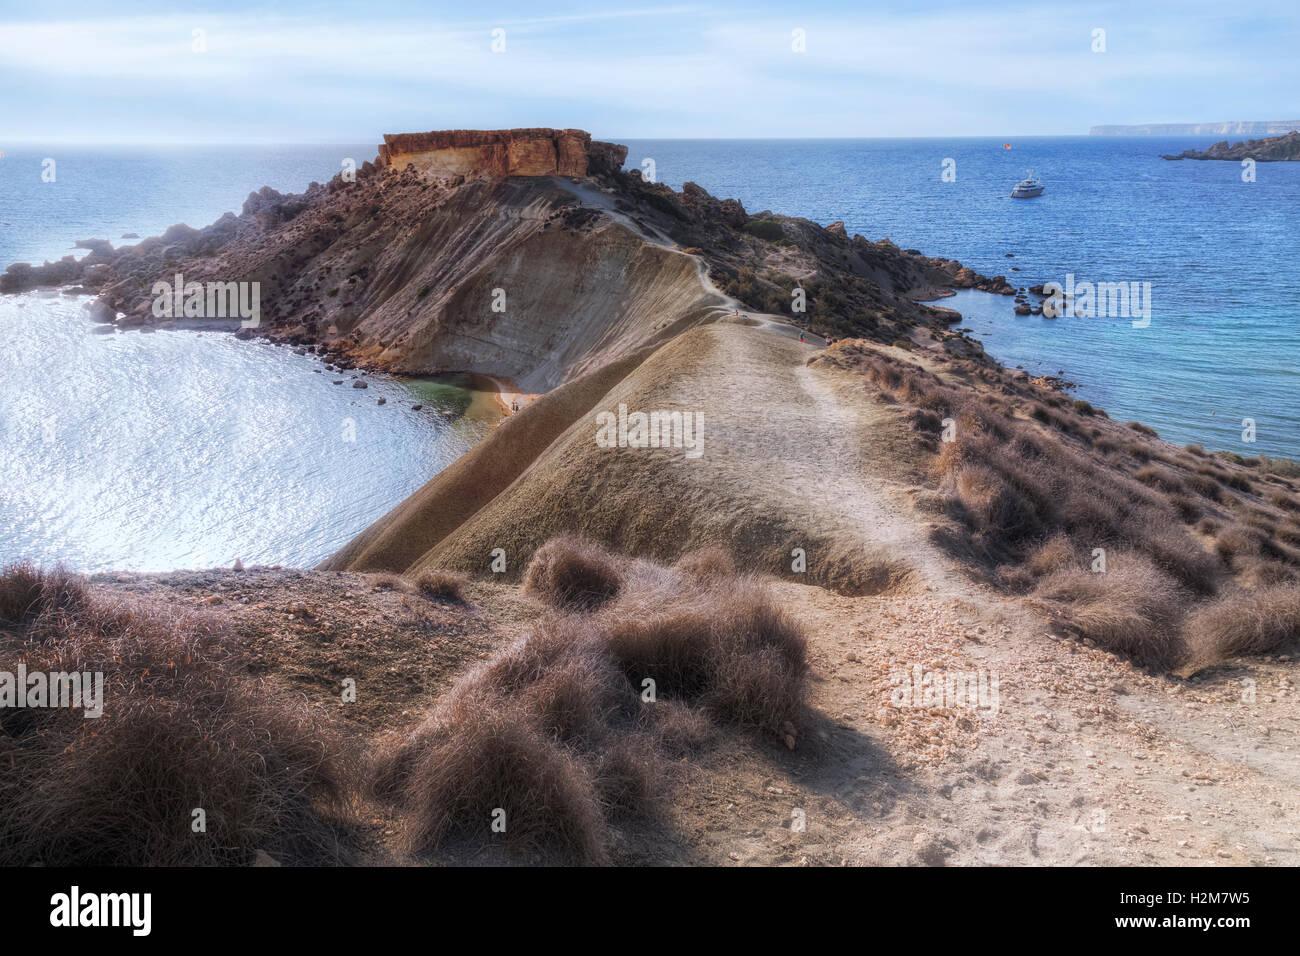 Il-Karraba, Gnejna Bay, Golden Bay, Malta - Stock Image